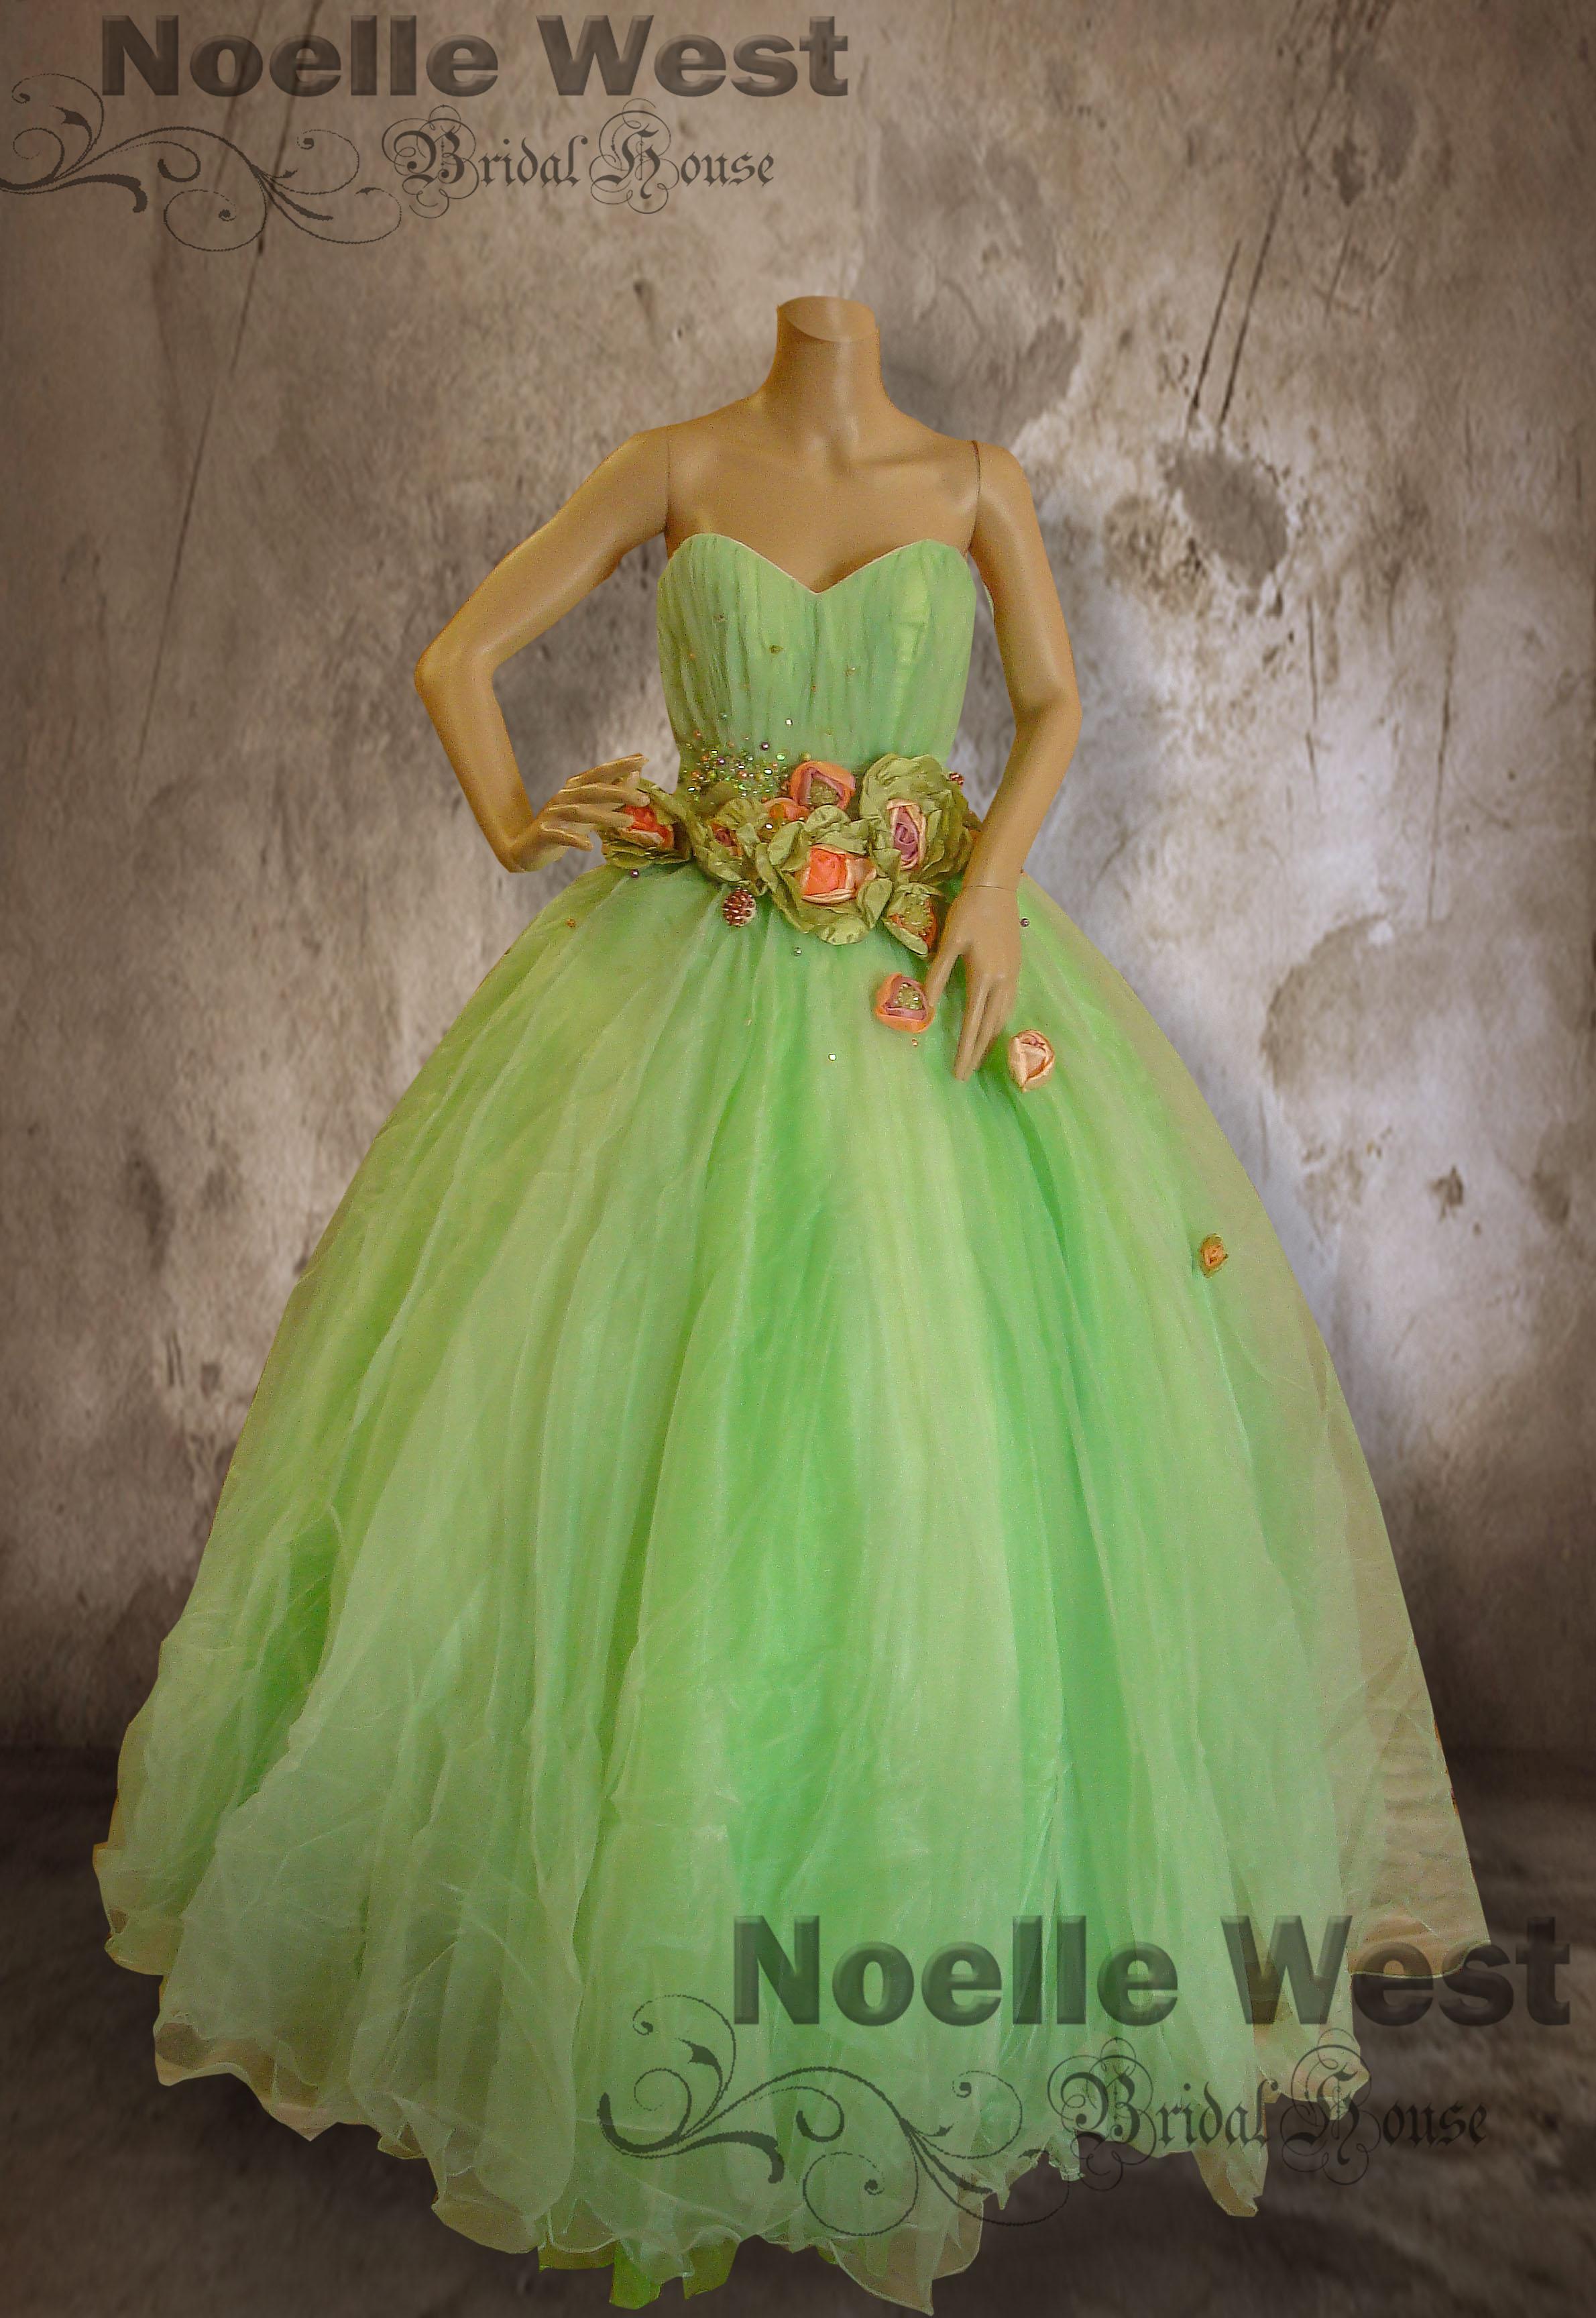 Noelle West Bridals Shop Cebu Ormoc Tacloban Iloilo Bacolod Dipolog